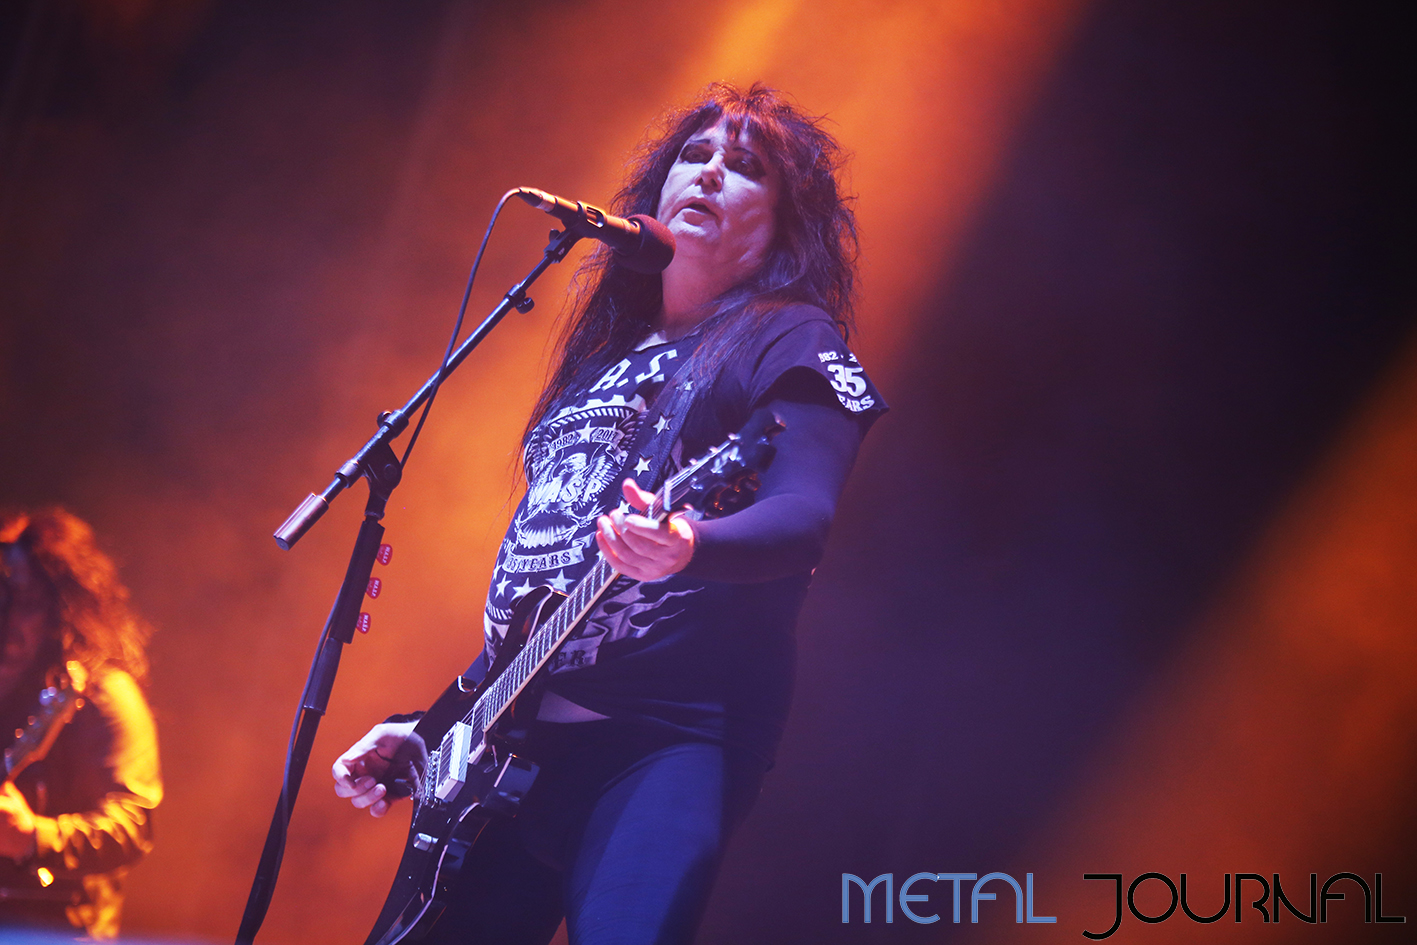 wasp - metal journal rock fest barcelona 2019 pic 1